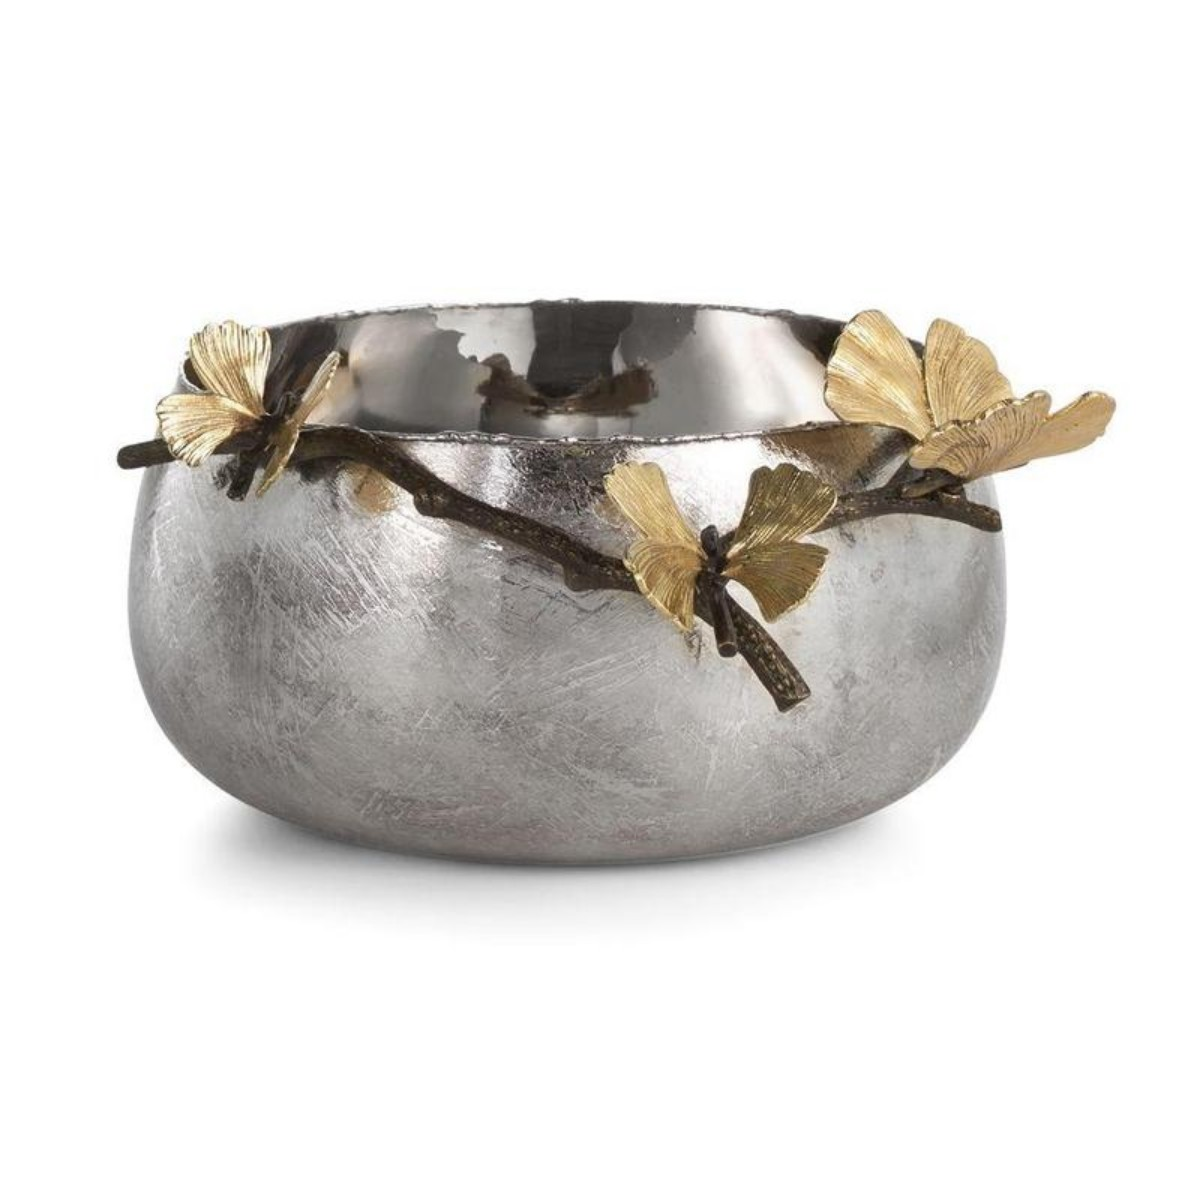 Michael Aram I Butterfly Ginkgo Serving Bowl